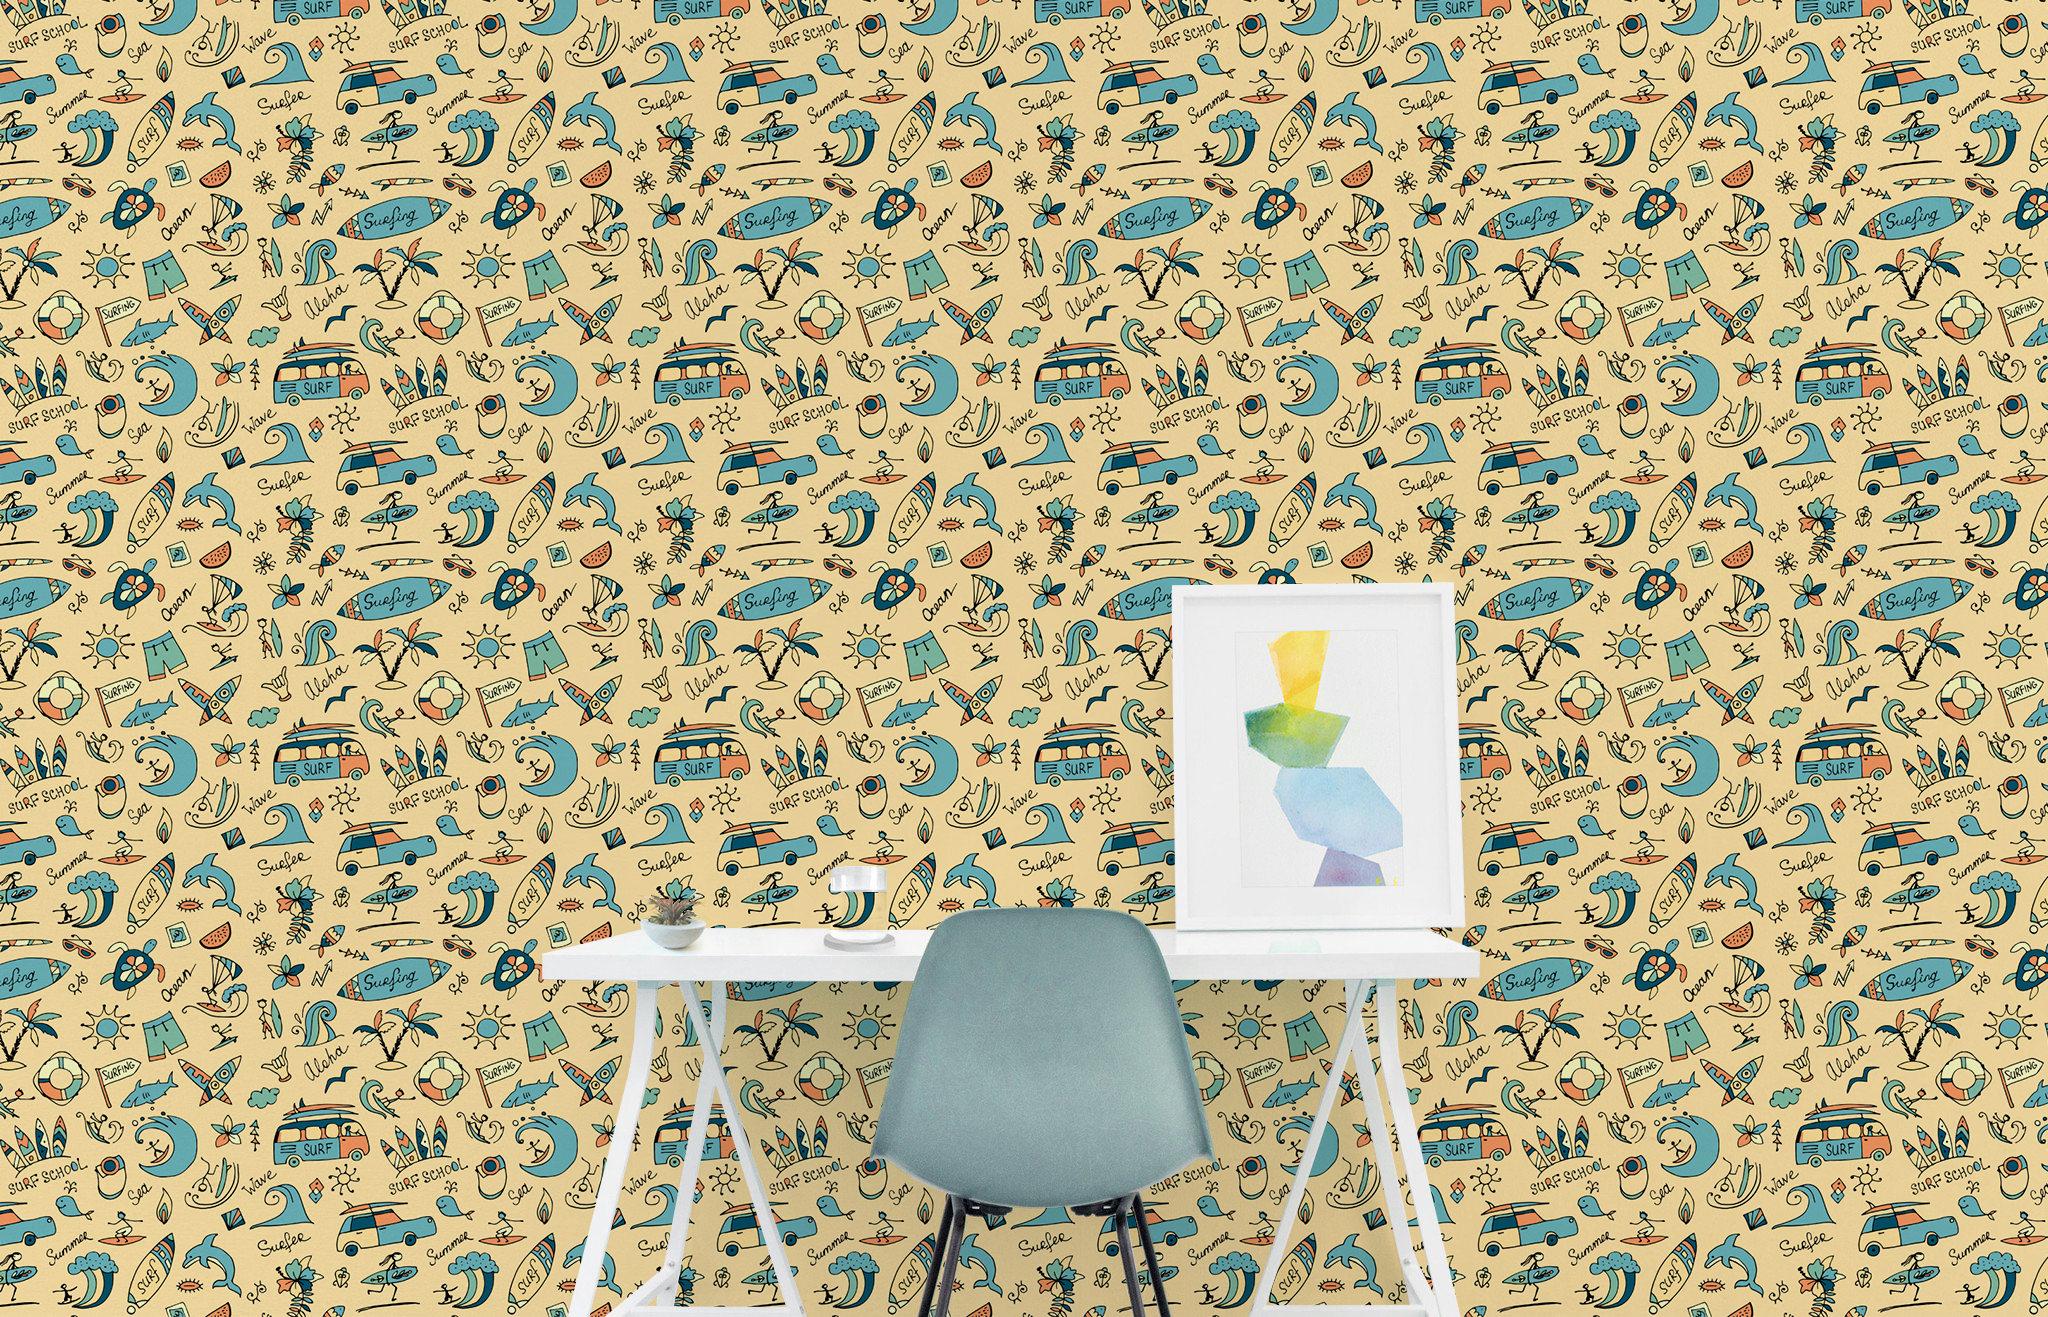 Surfer Wallpaper Nursery Wallpaper Peel and Stick Wallpaper | Etsy